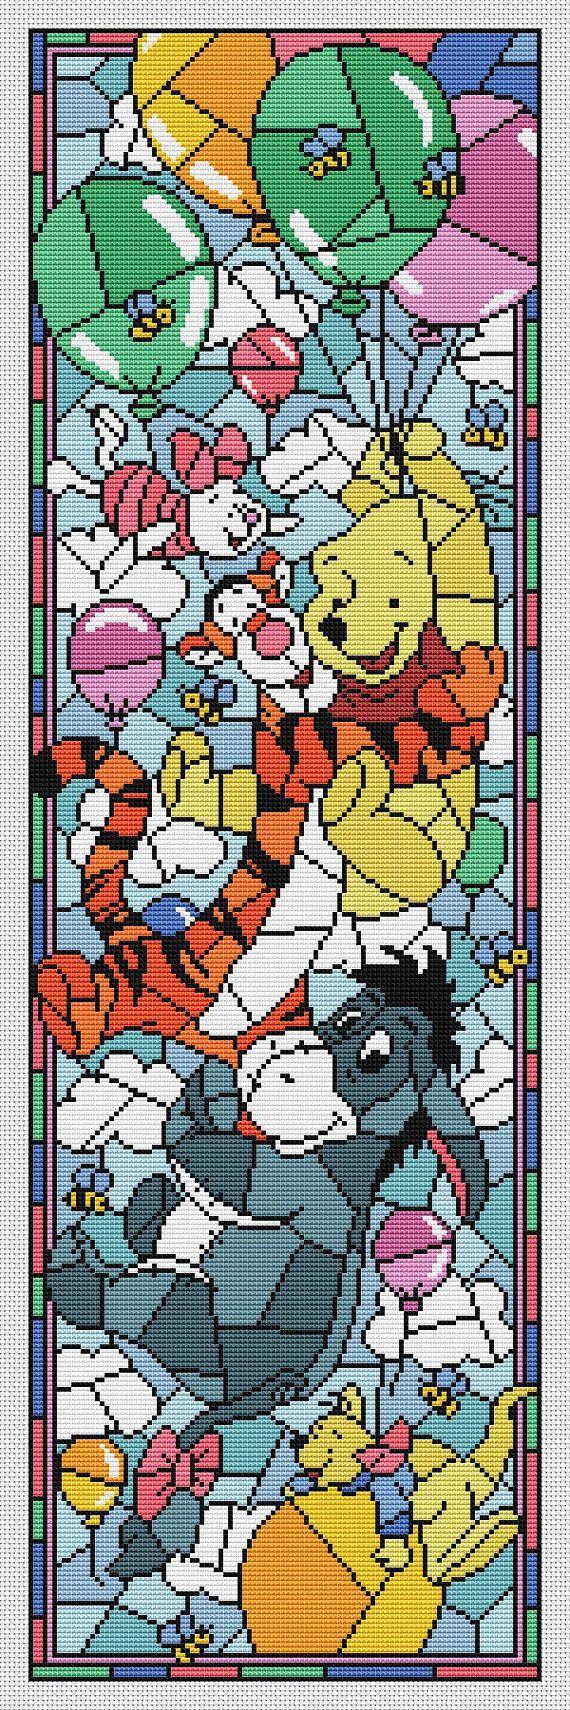 Disney cross stitch pattern Winnie the Pooh in